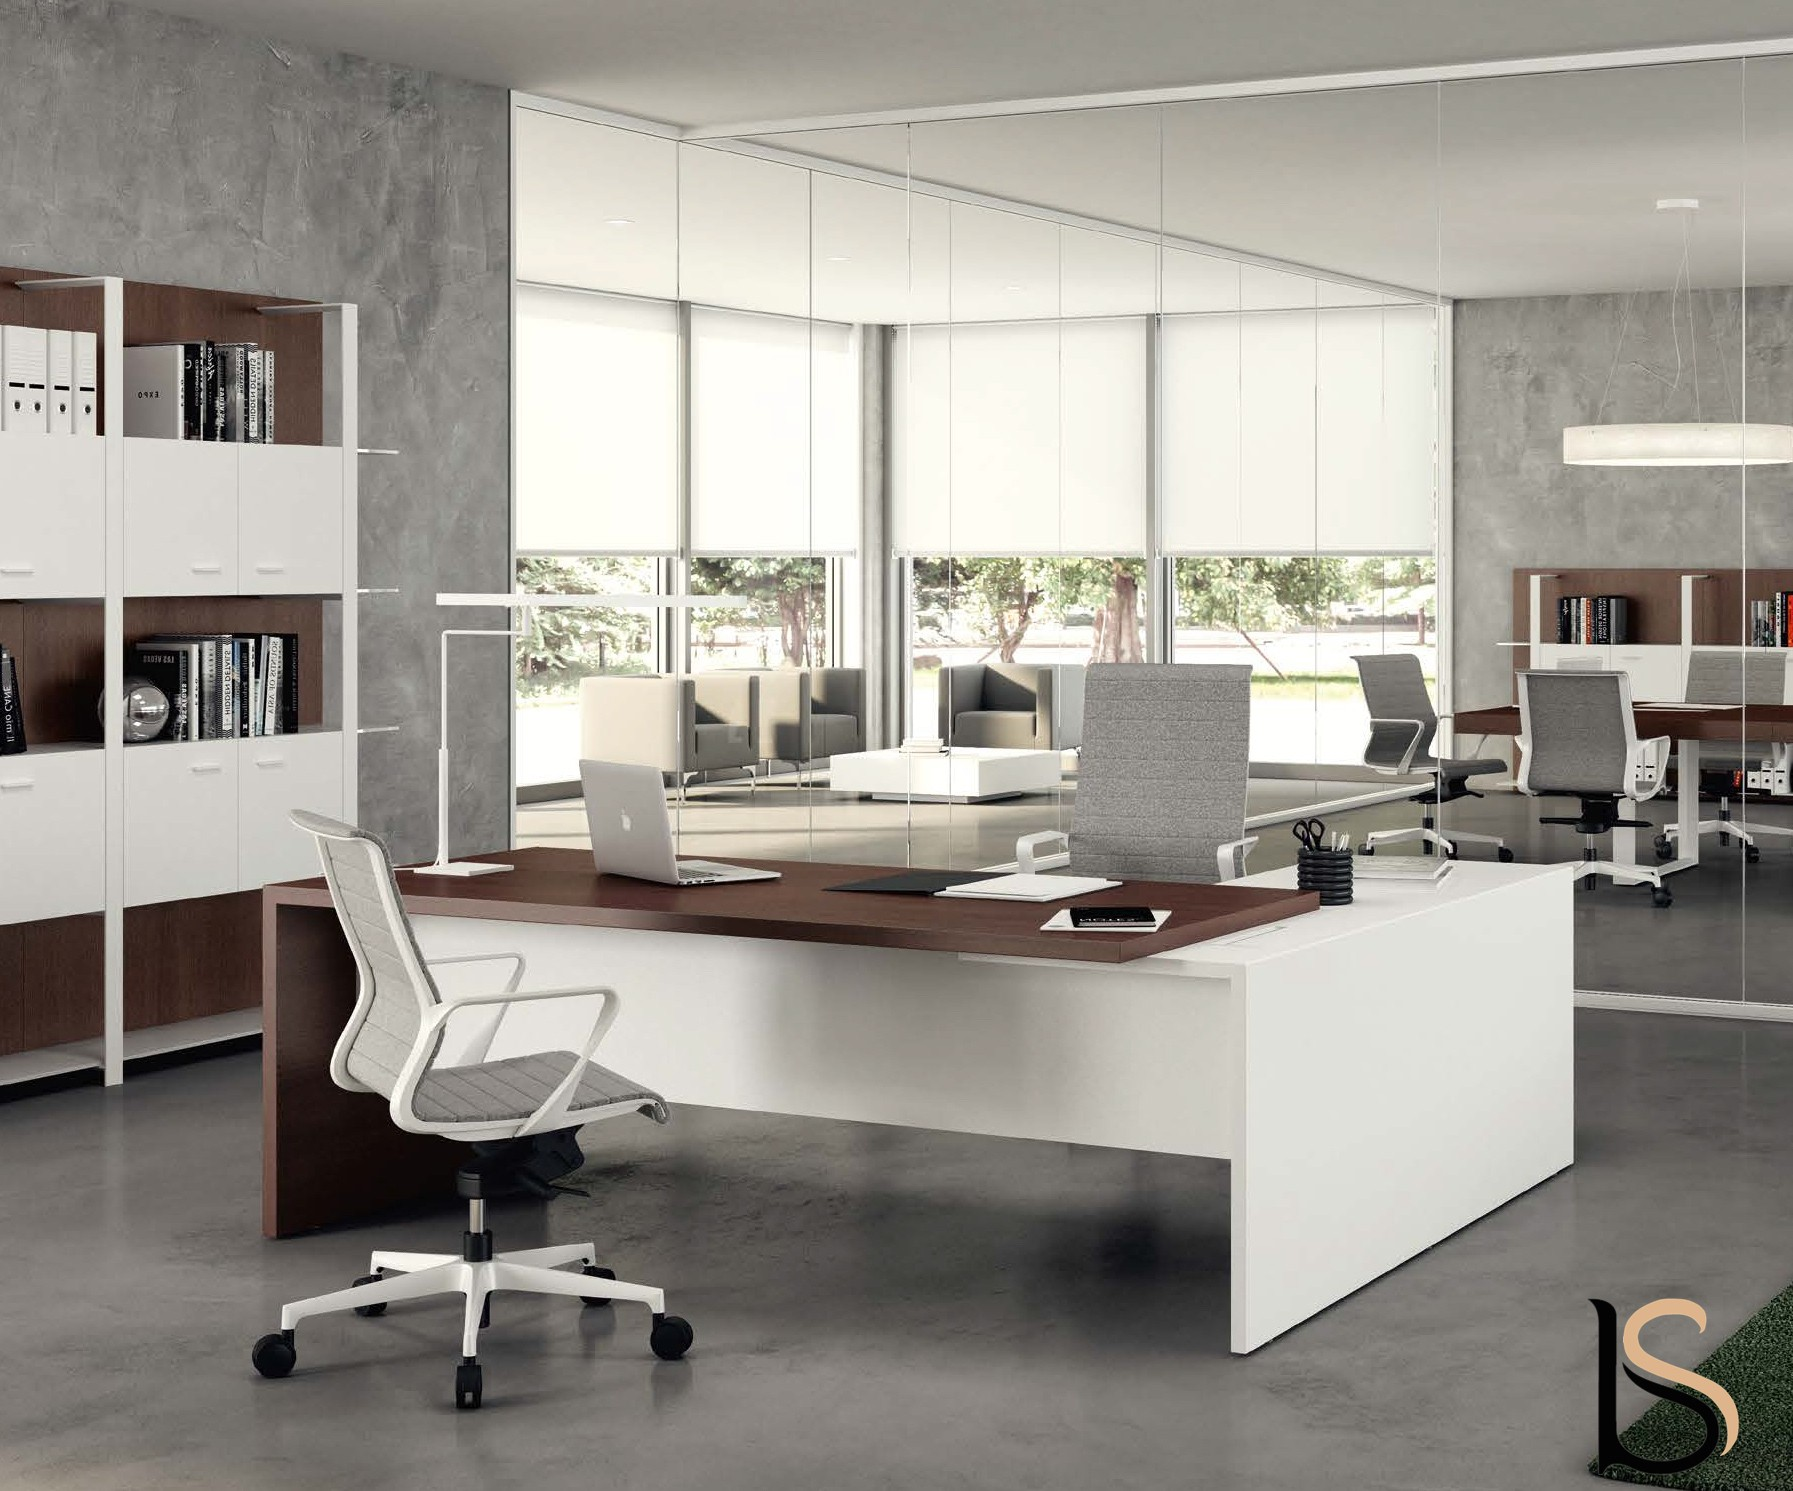 Bureau d 39 angle t45 bi colore quadrifoglio bureaux de for Mobilier bureau quadrifoglio